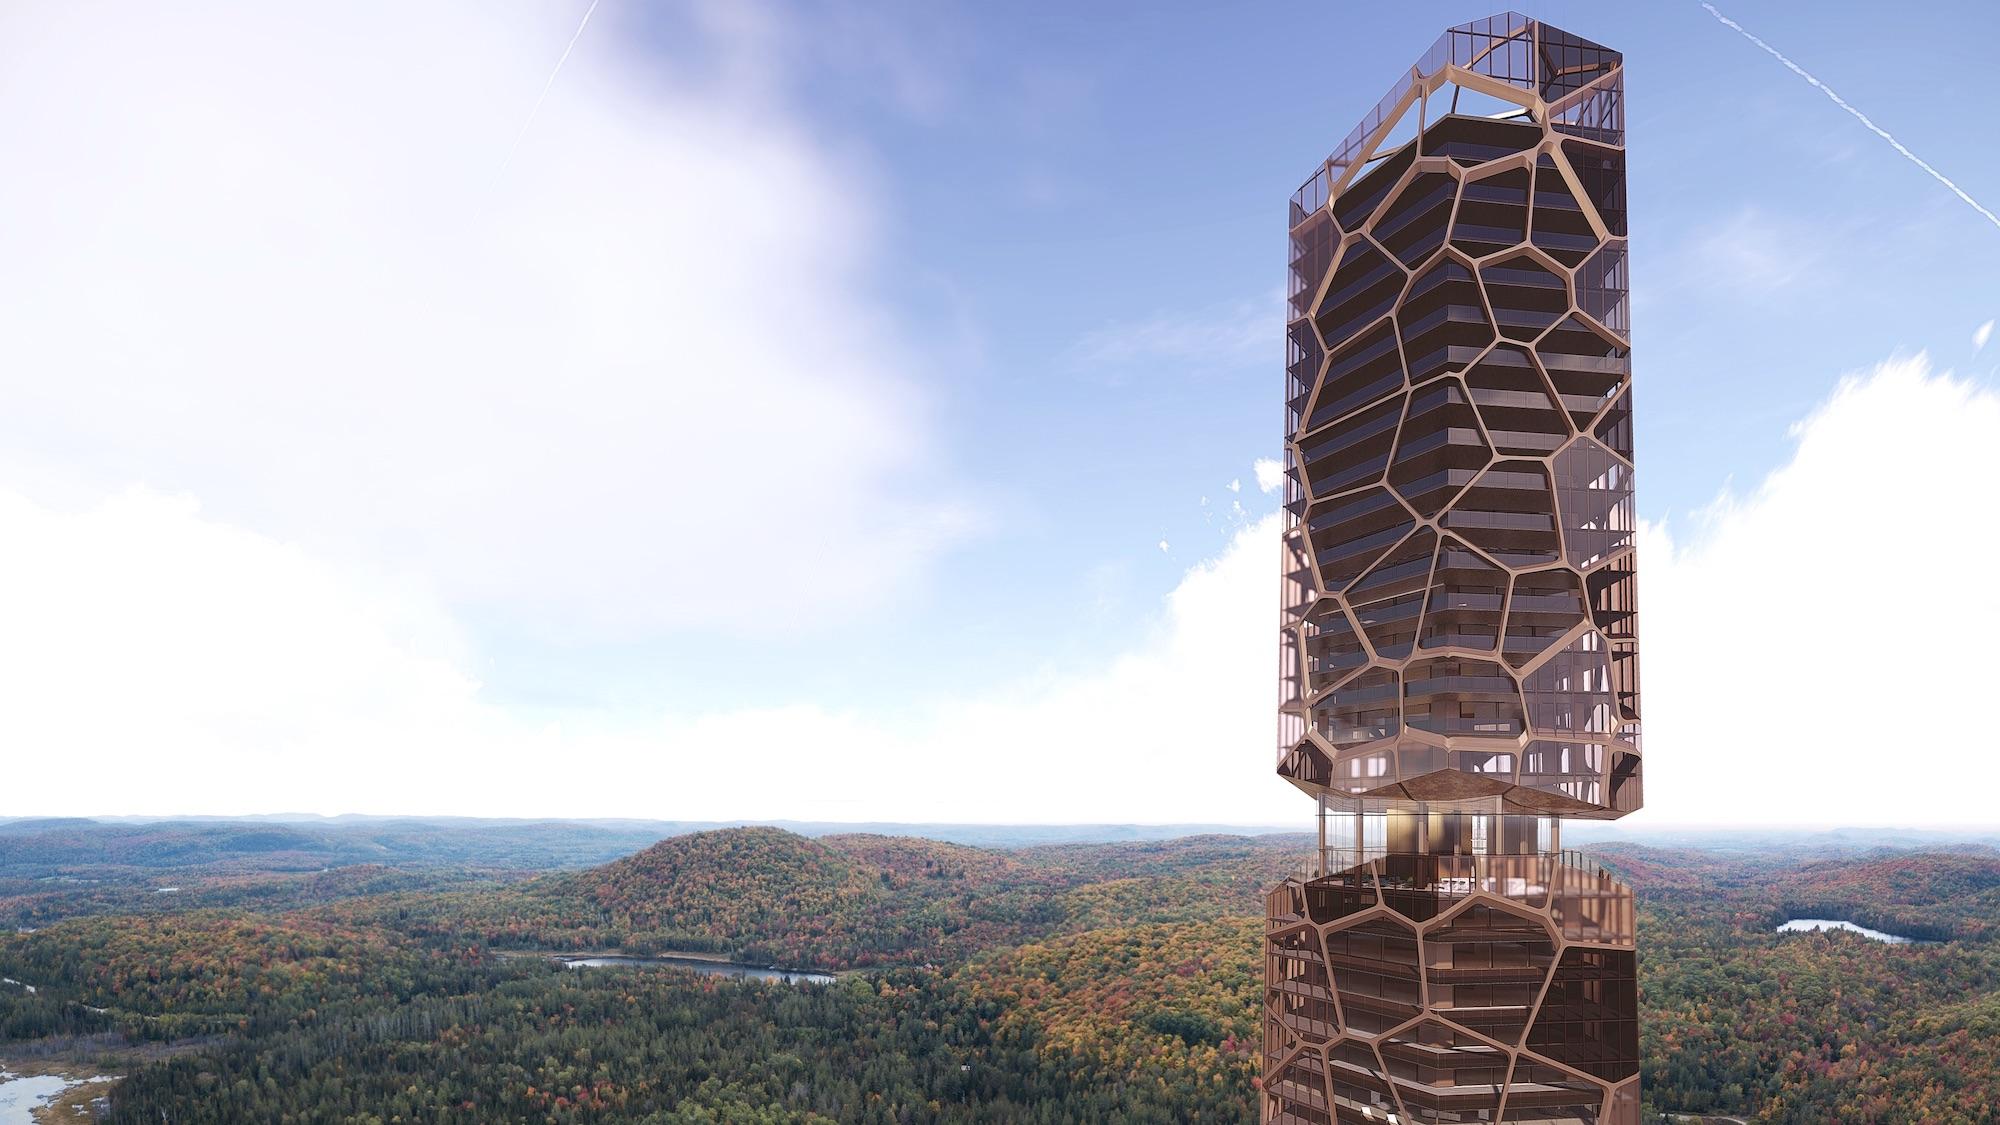 a skyscraper in a remote forest in Canada